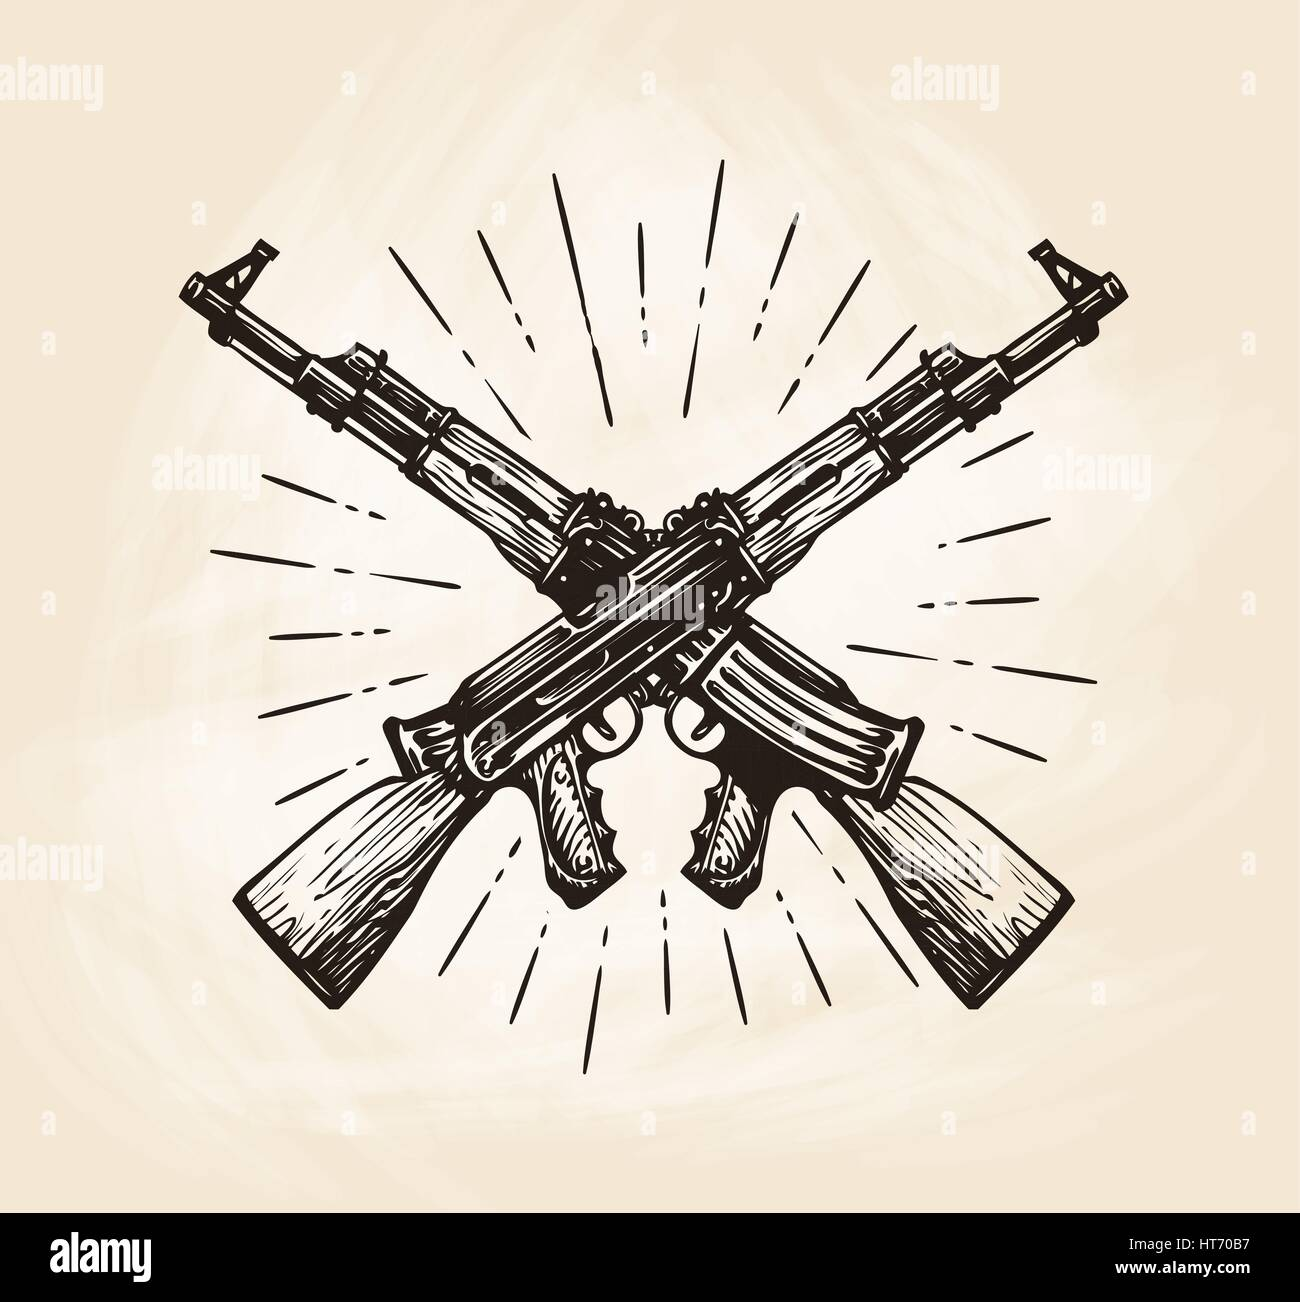 Hand-drawn crossed automatic machines of Kalashnikov, sketch. Weapon vector illustration - Stock Vector